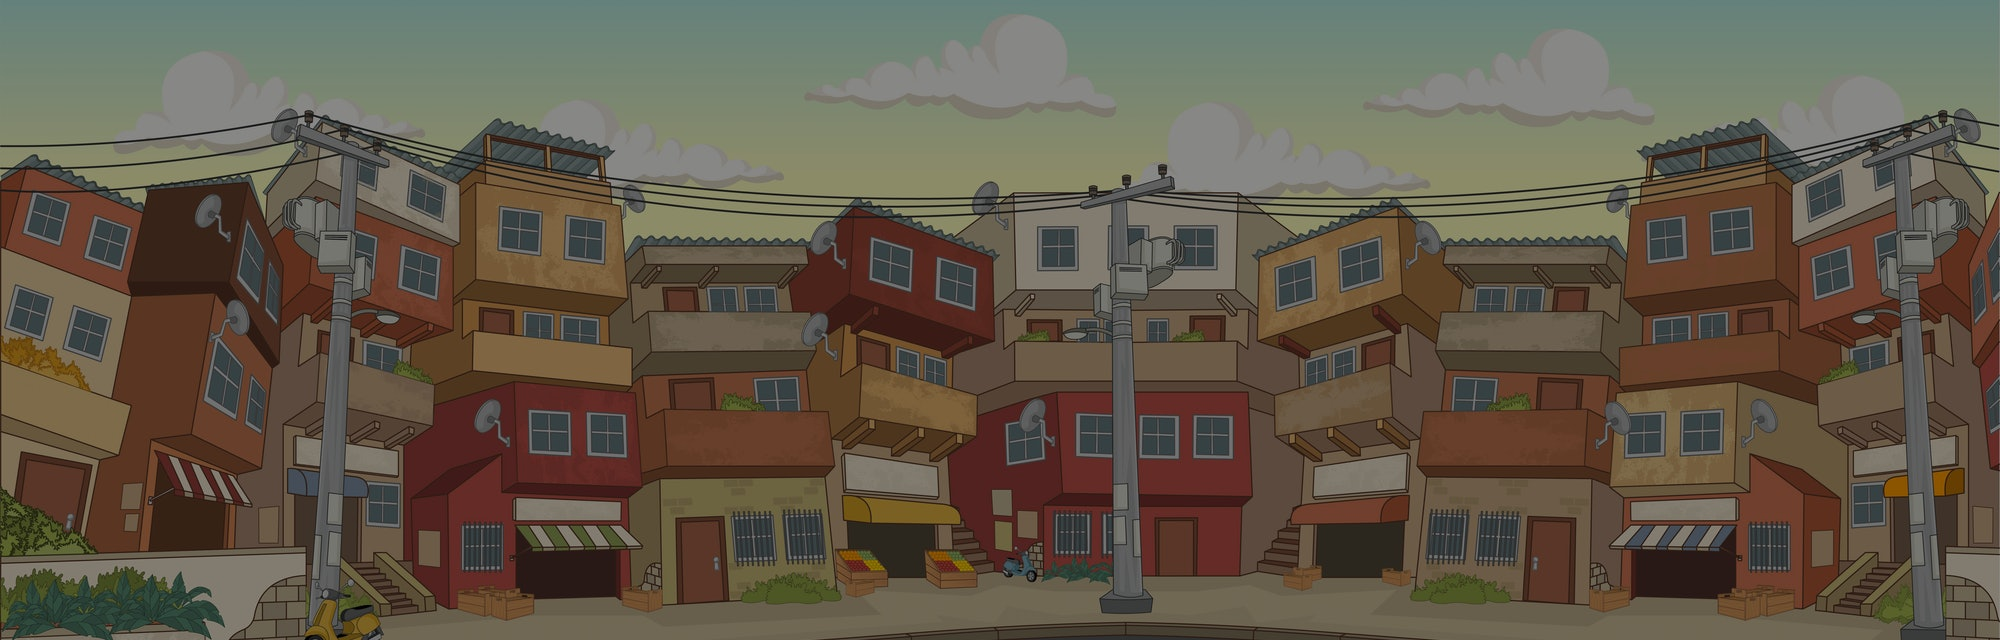 Street of poor neighborhood in the city. Slum. Favela.